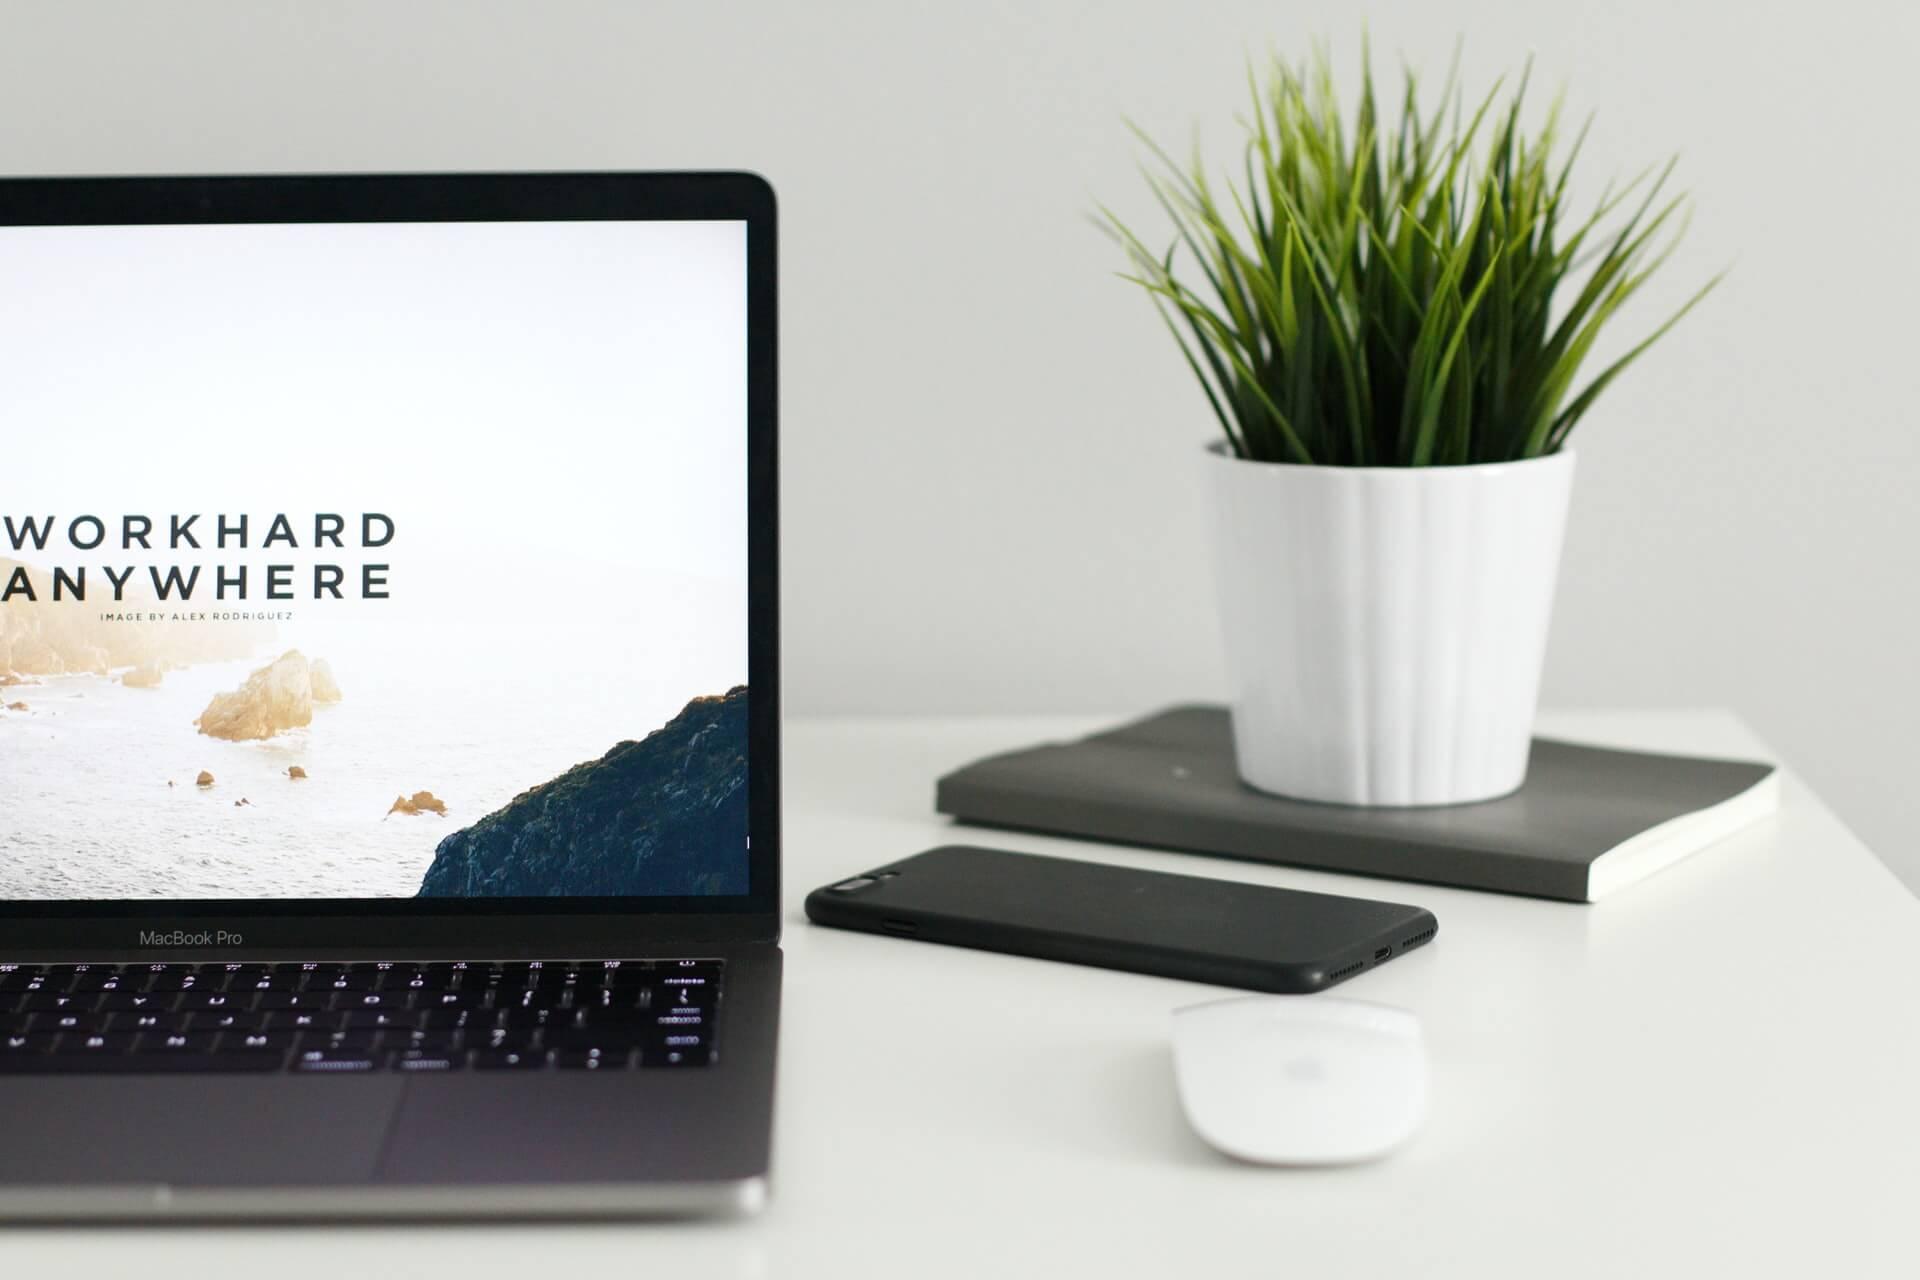 TWP Digital Marketing designs small business websites that convert.